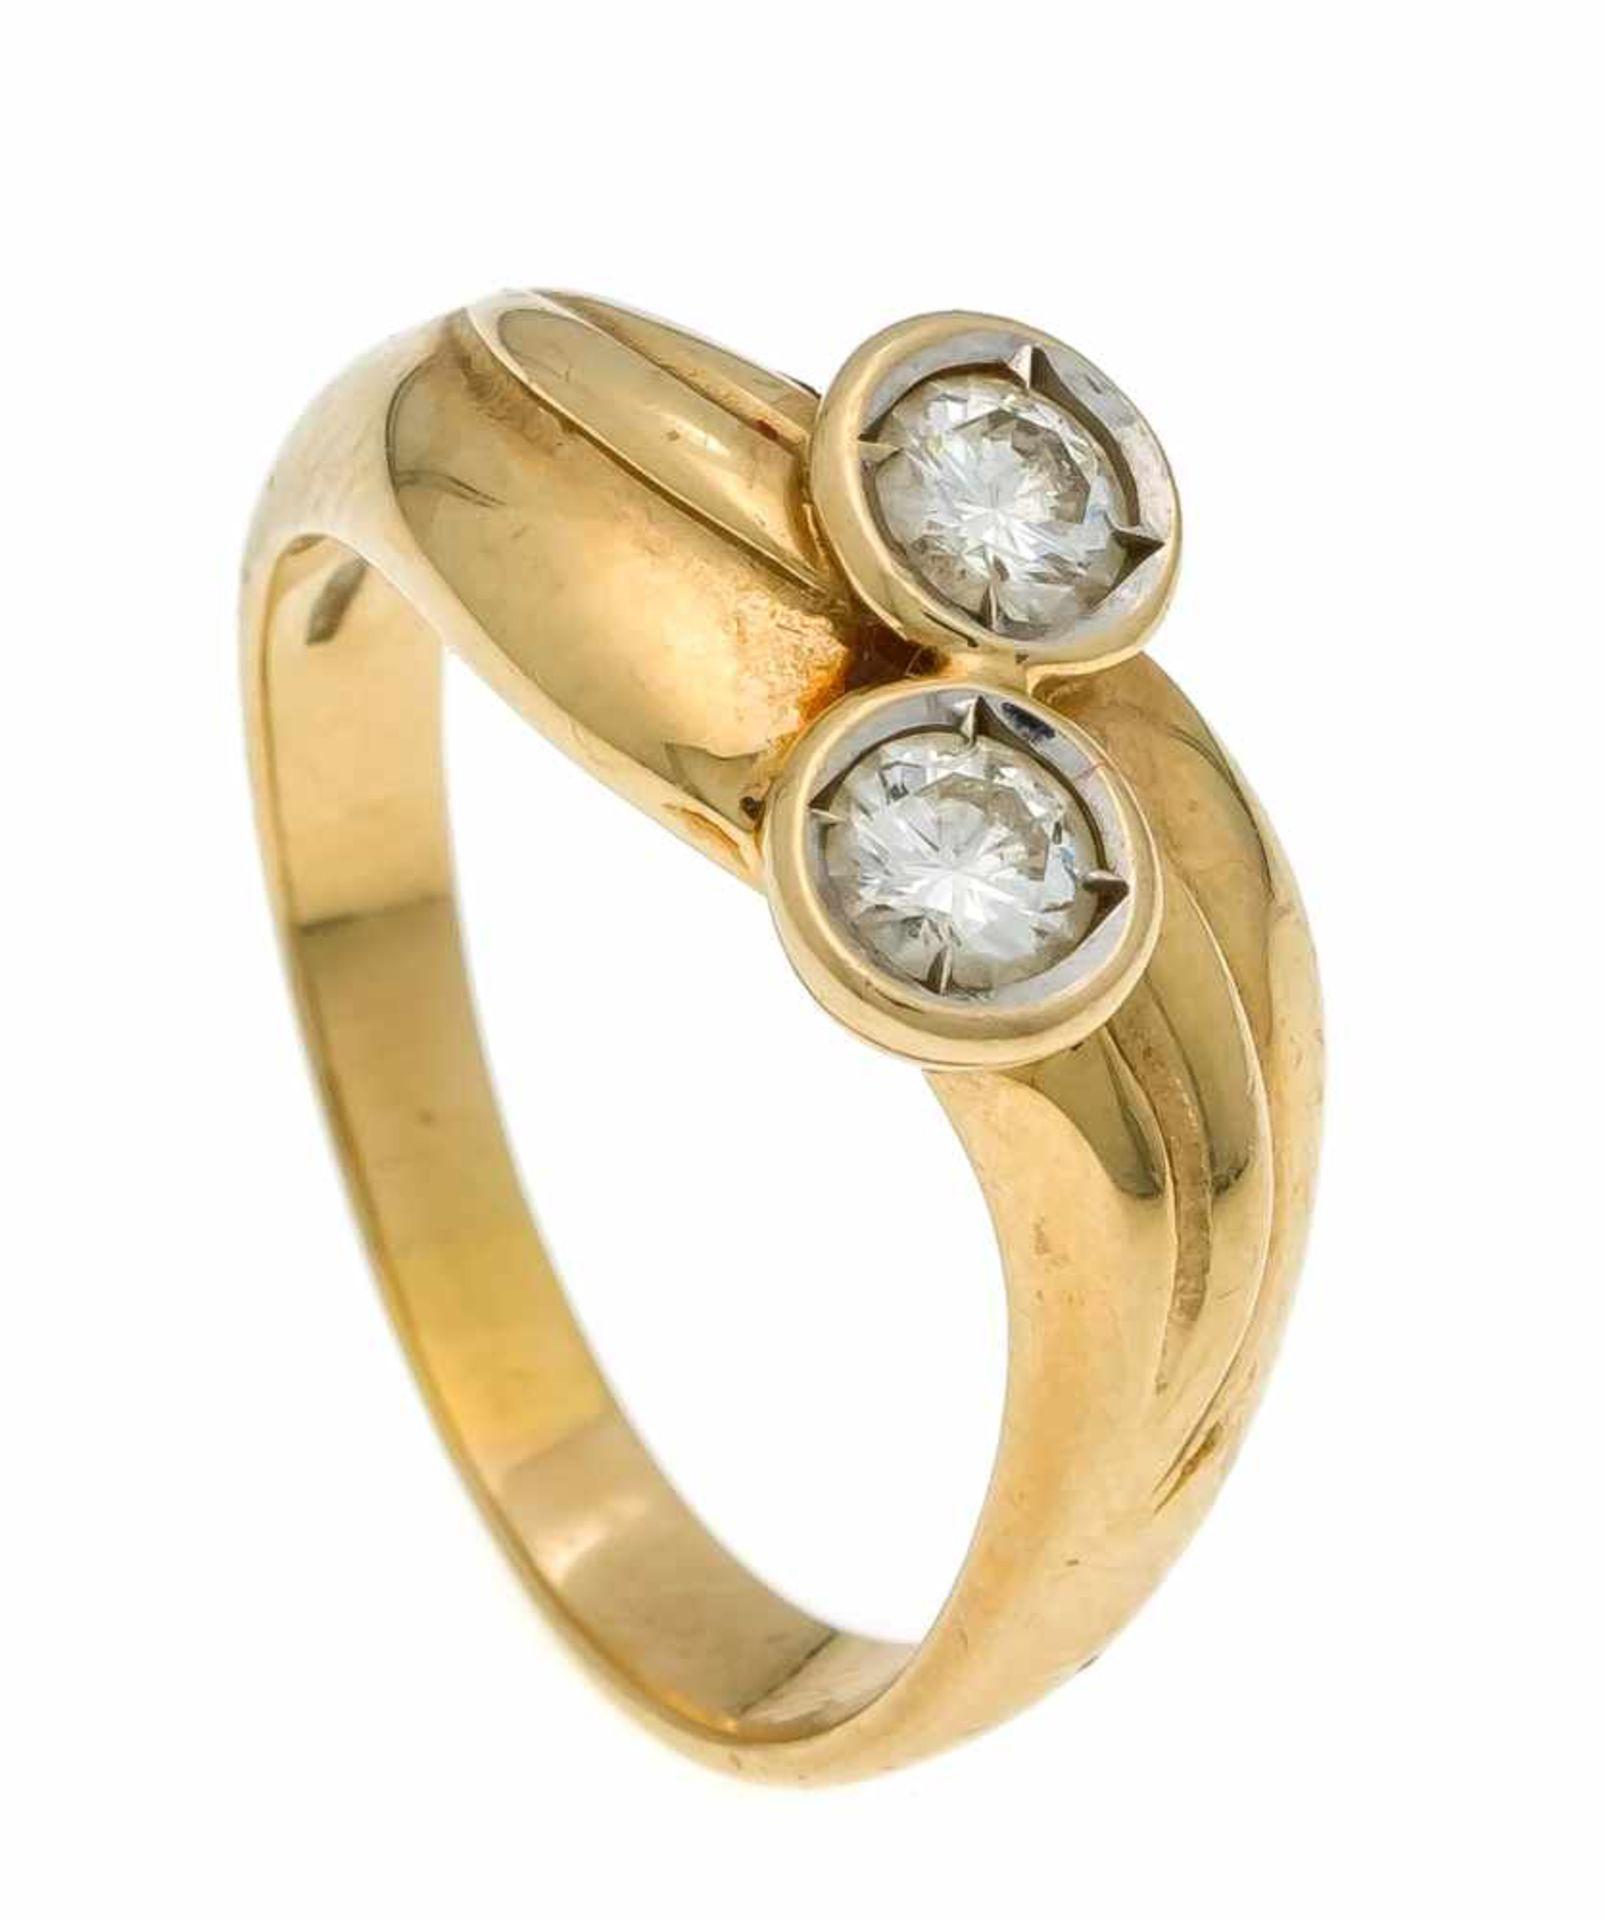 Brillant-Ring GG 585/000 mit 2 Brillanten, zus. 0,46 ct l.get.W/VS, RG 57, 4,4 gDiamond ring, gold